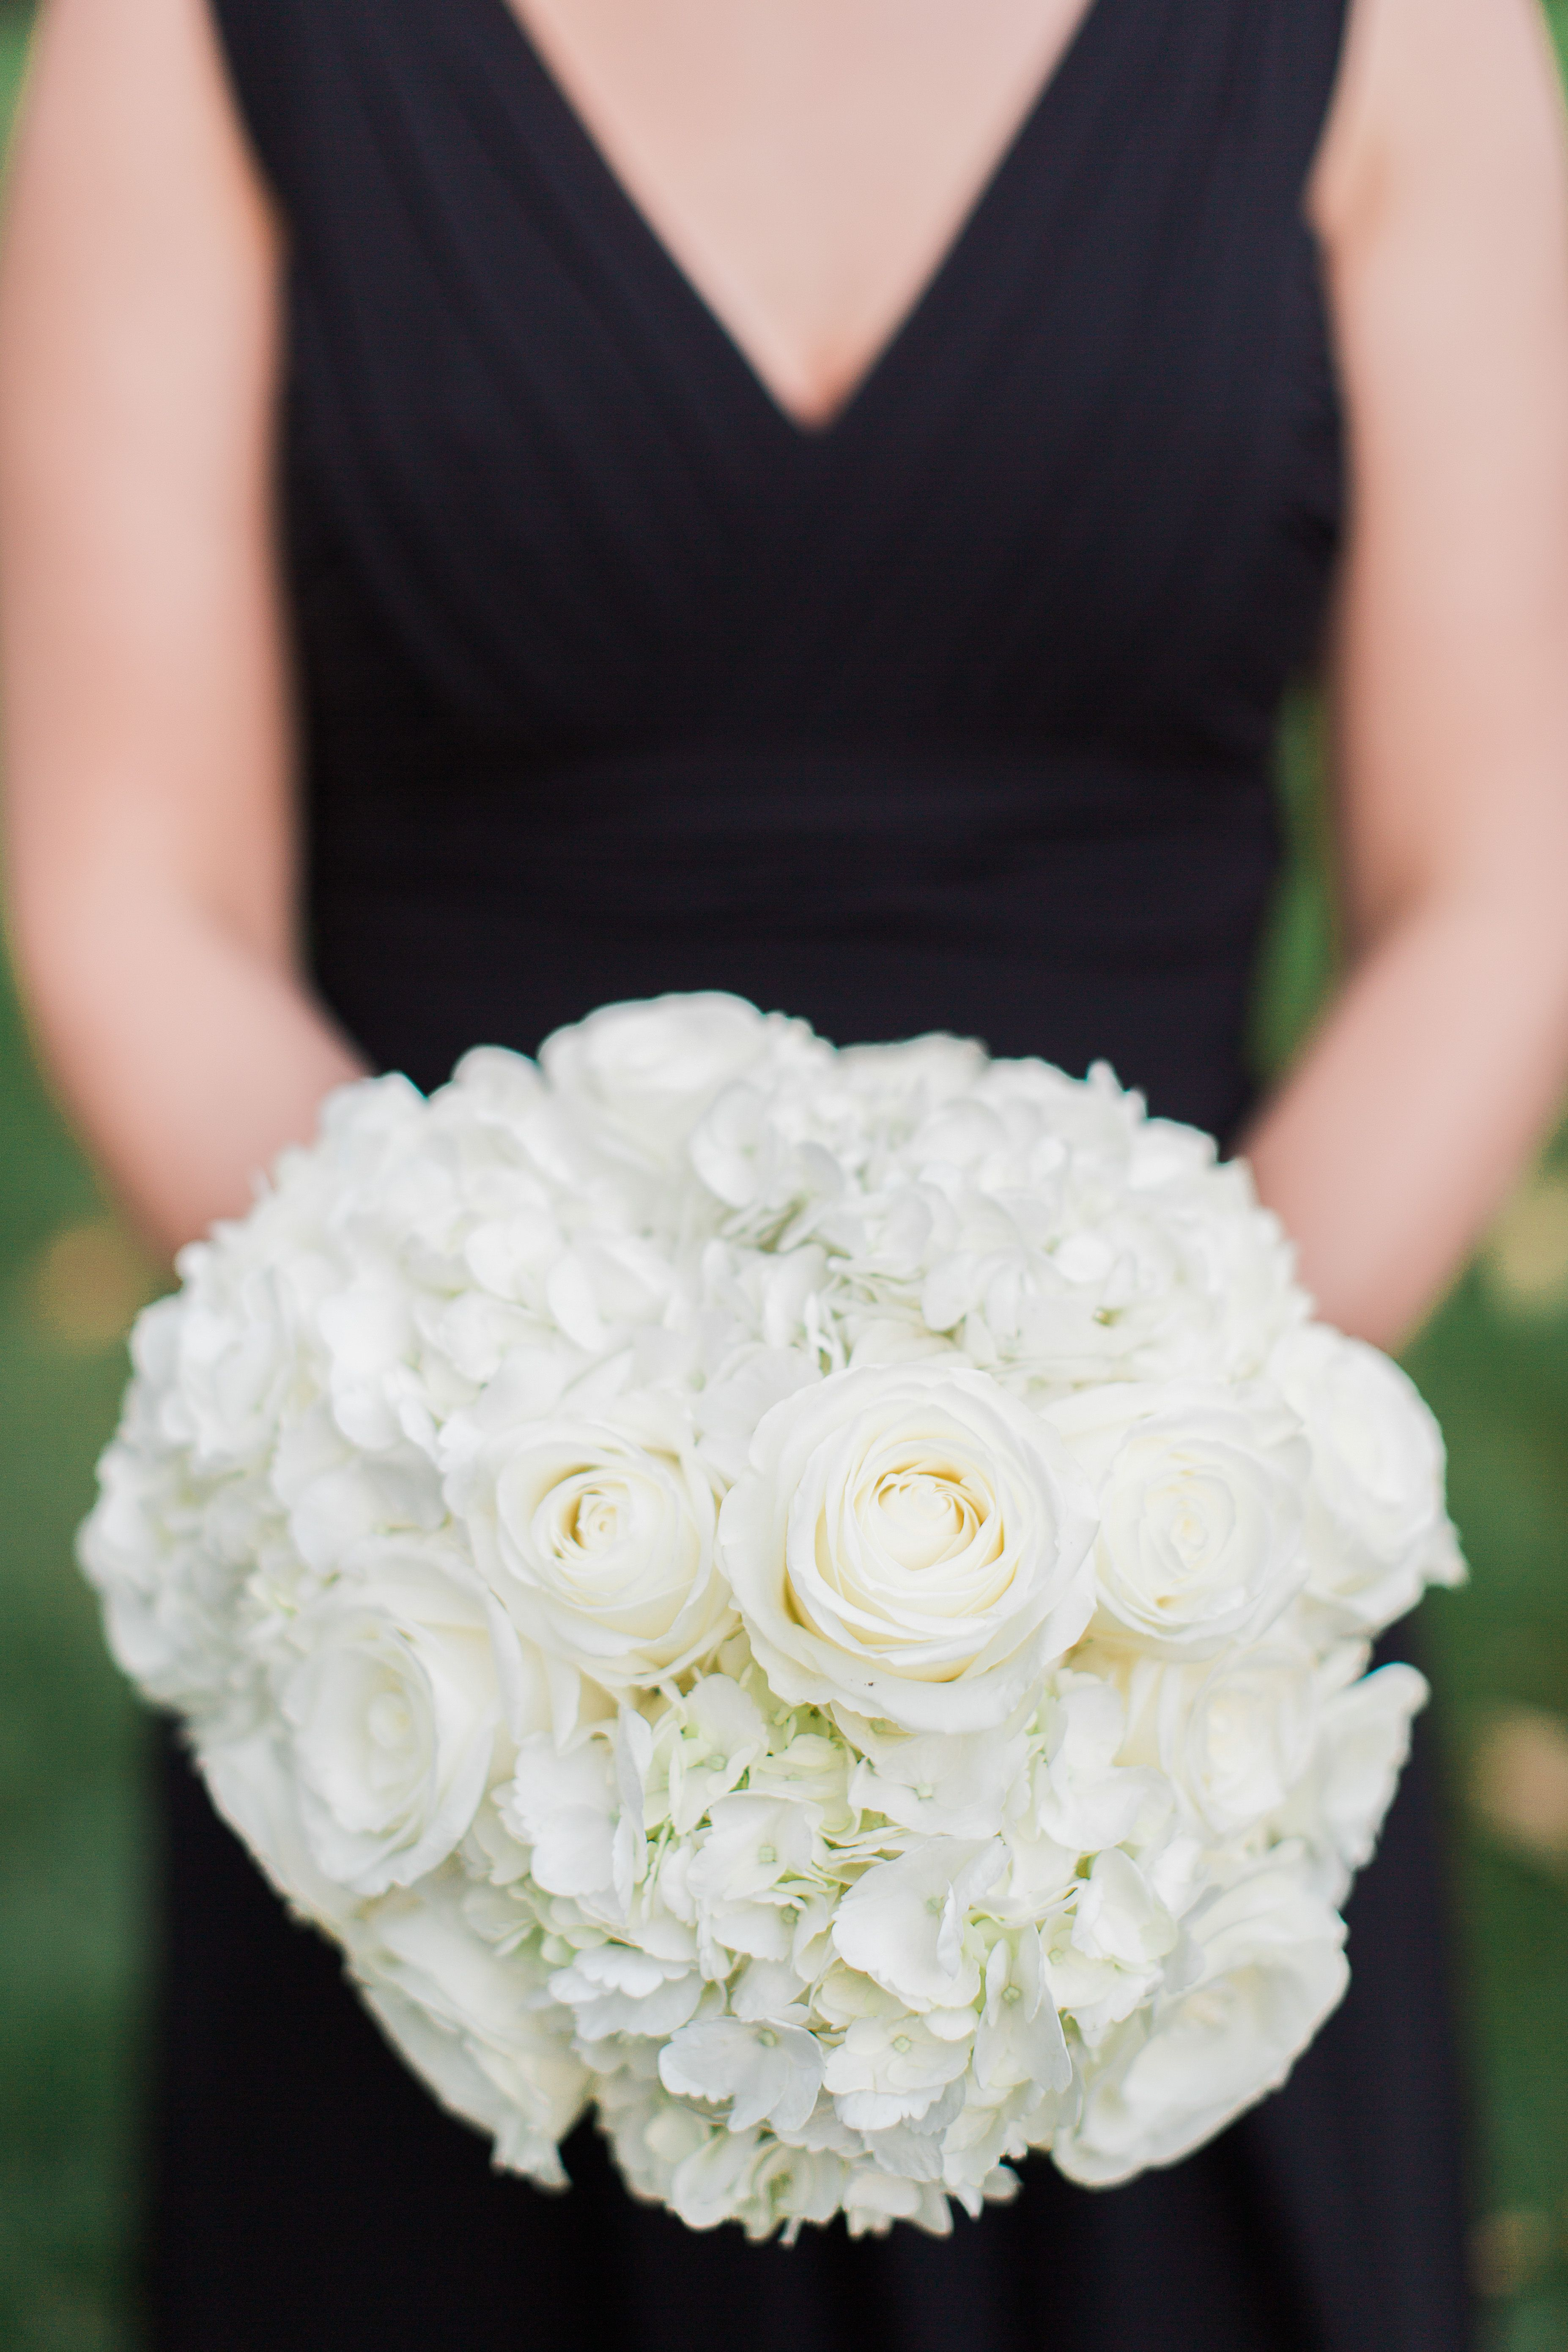 Classic white rose hydrangea bridesmaid bouquet